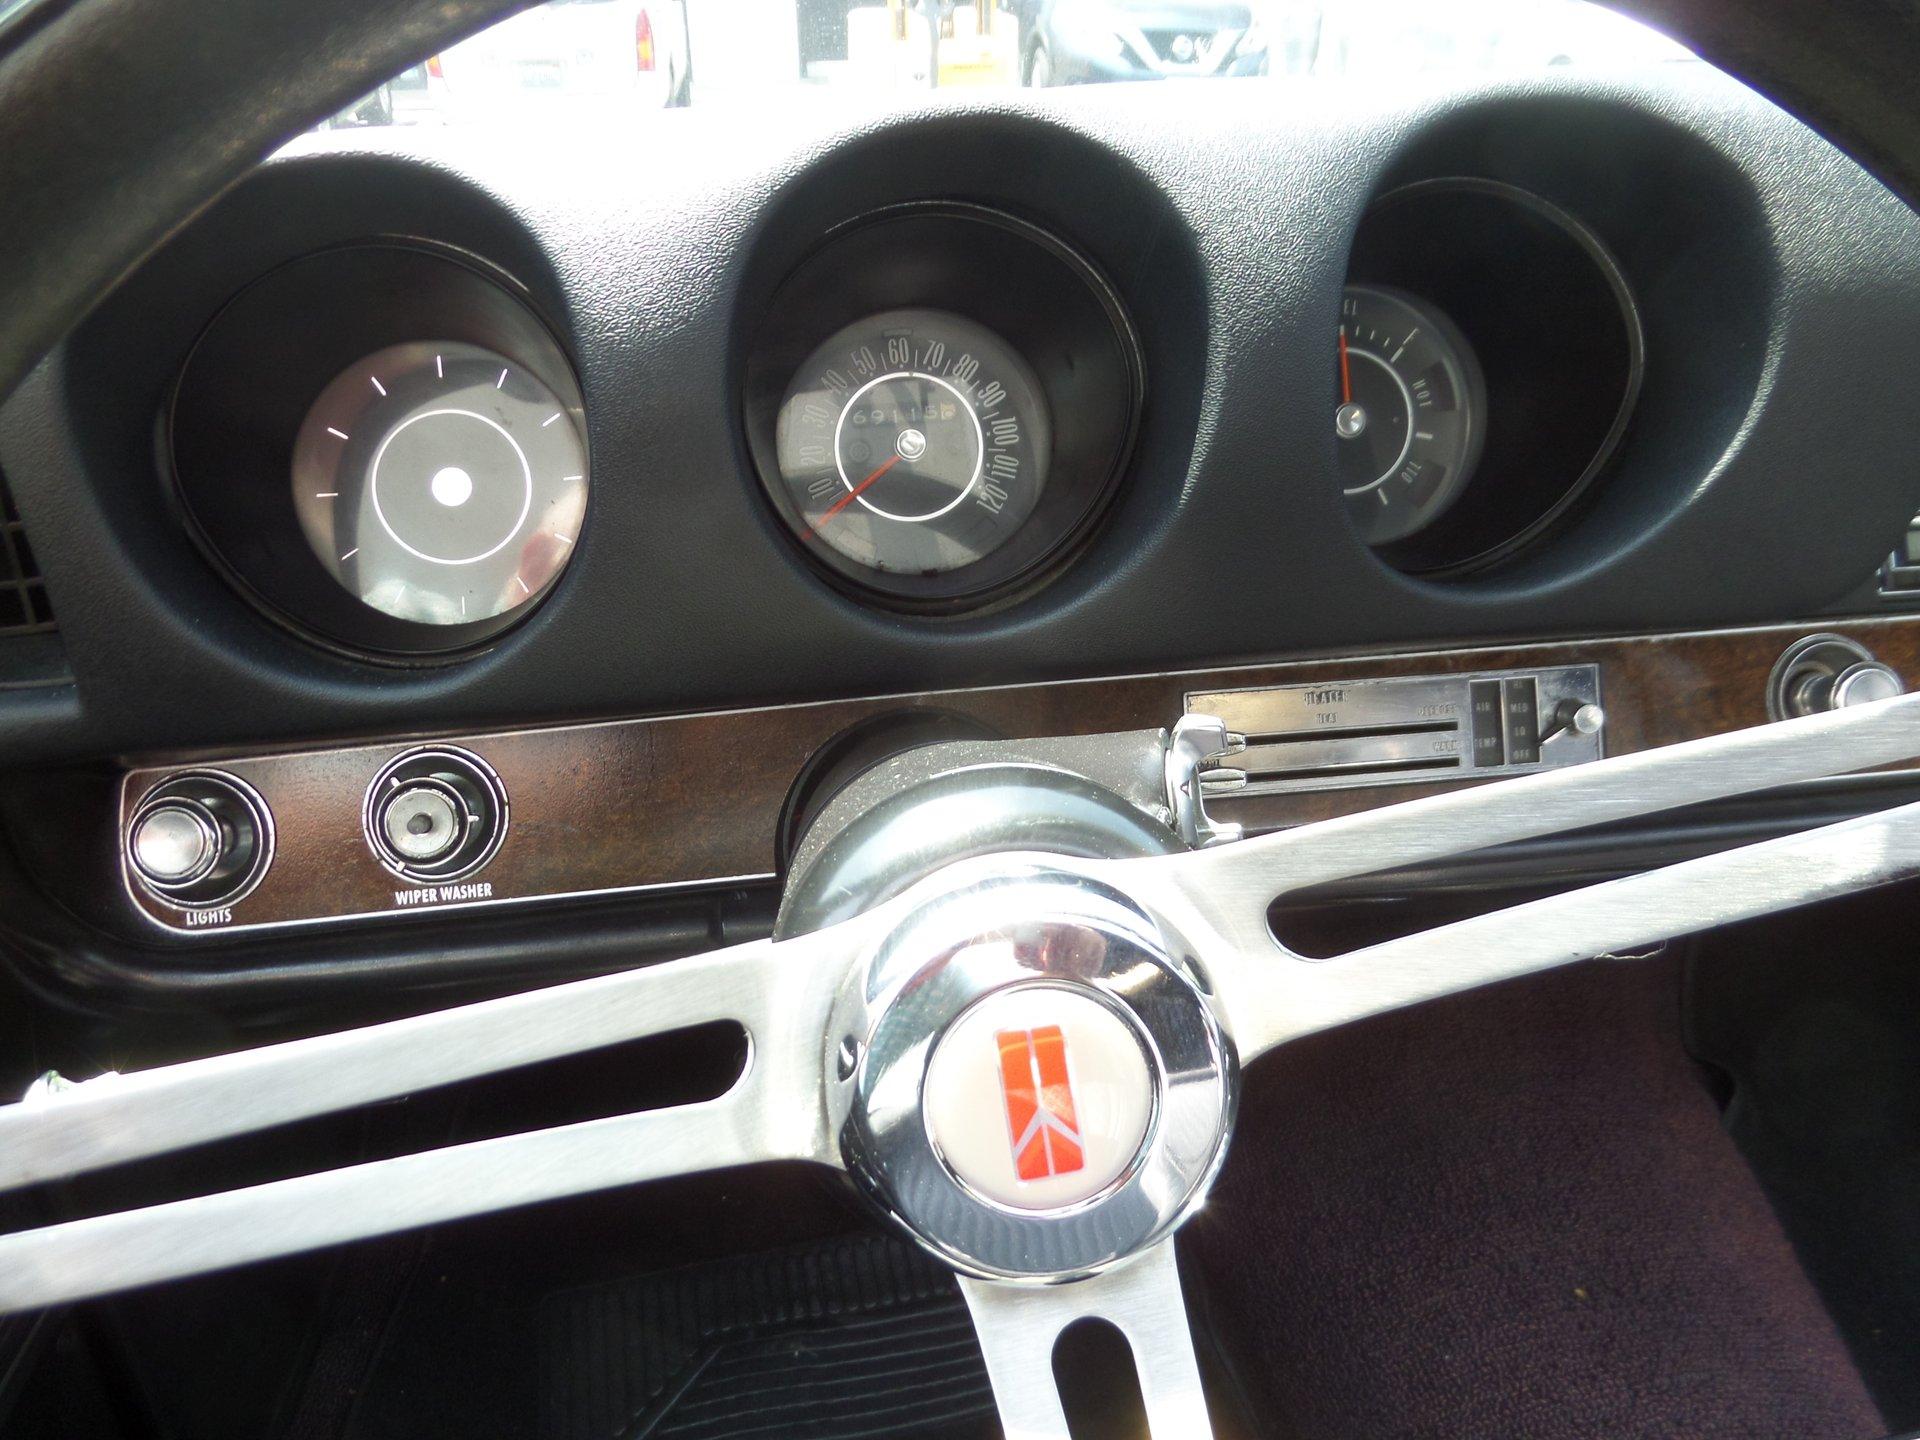 1969 Oldsmobile Cutlass | Laguna Classic Cars & Automotive Art